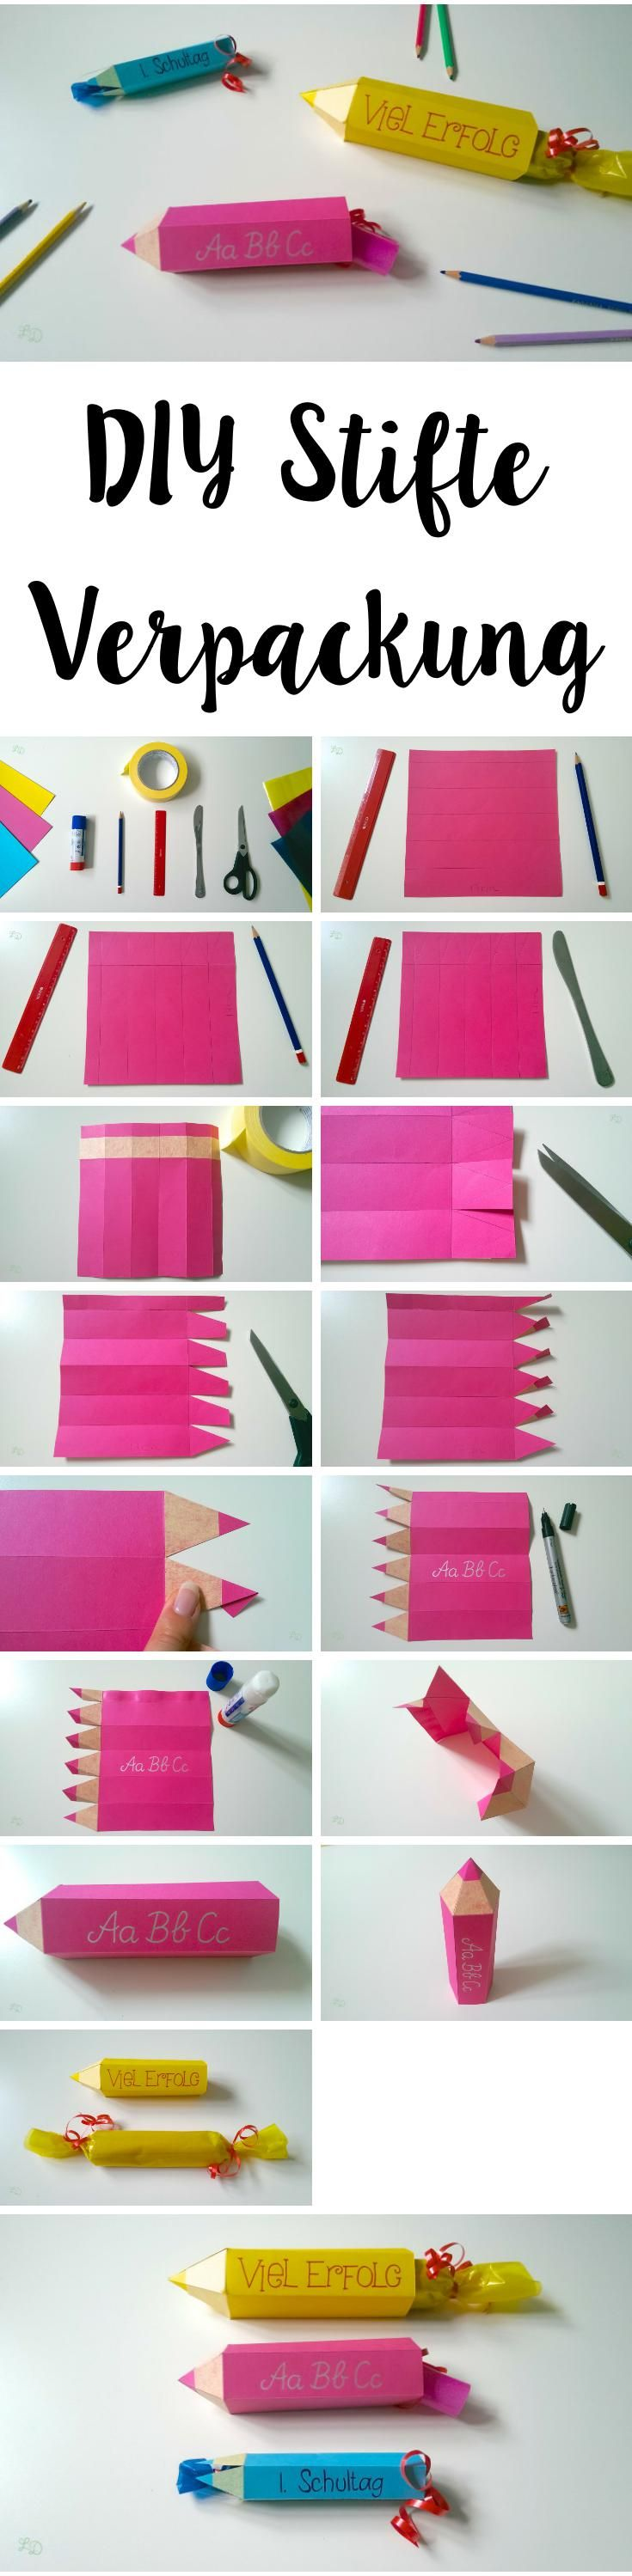 DIY Stifte Verpackung für die Schule | DIY Pencil Gift Wrapping